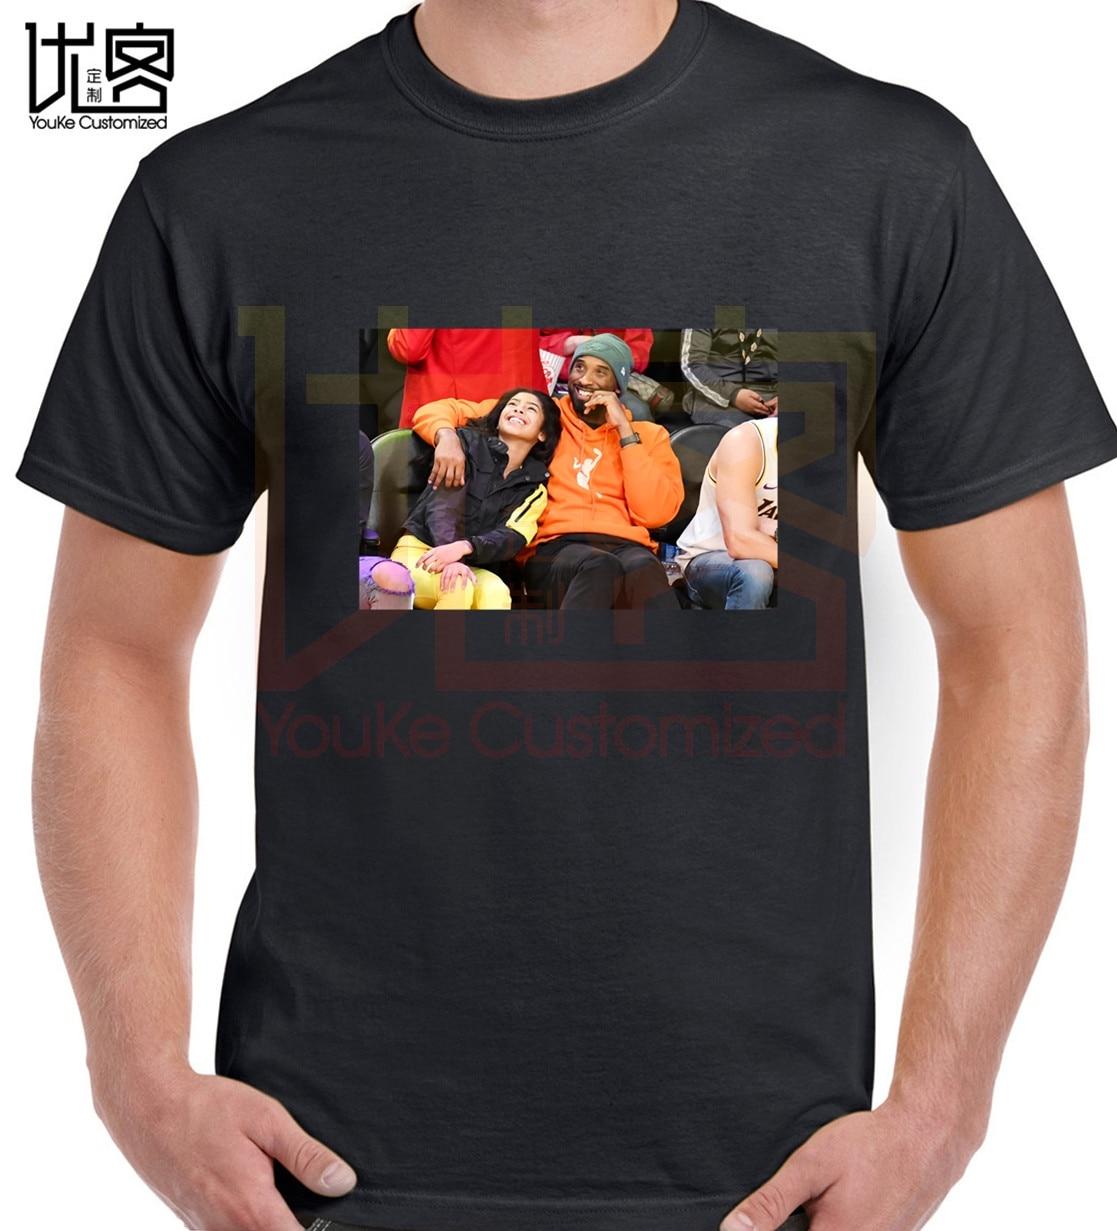 2020 Kobe Bryant and gigi Memorial T shirt men's women's new fashion Crewneck 100% cotton short sleeves printed t-shirt